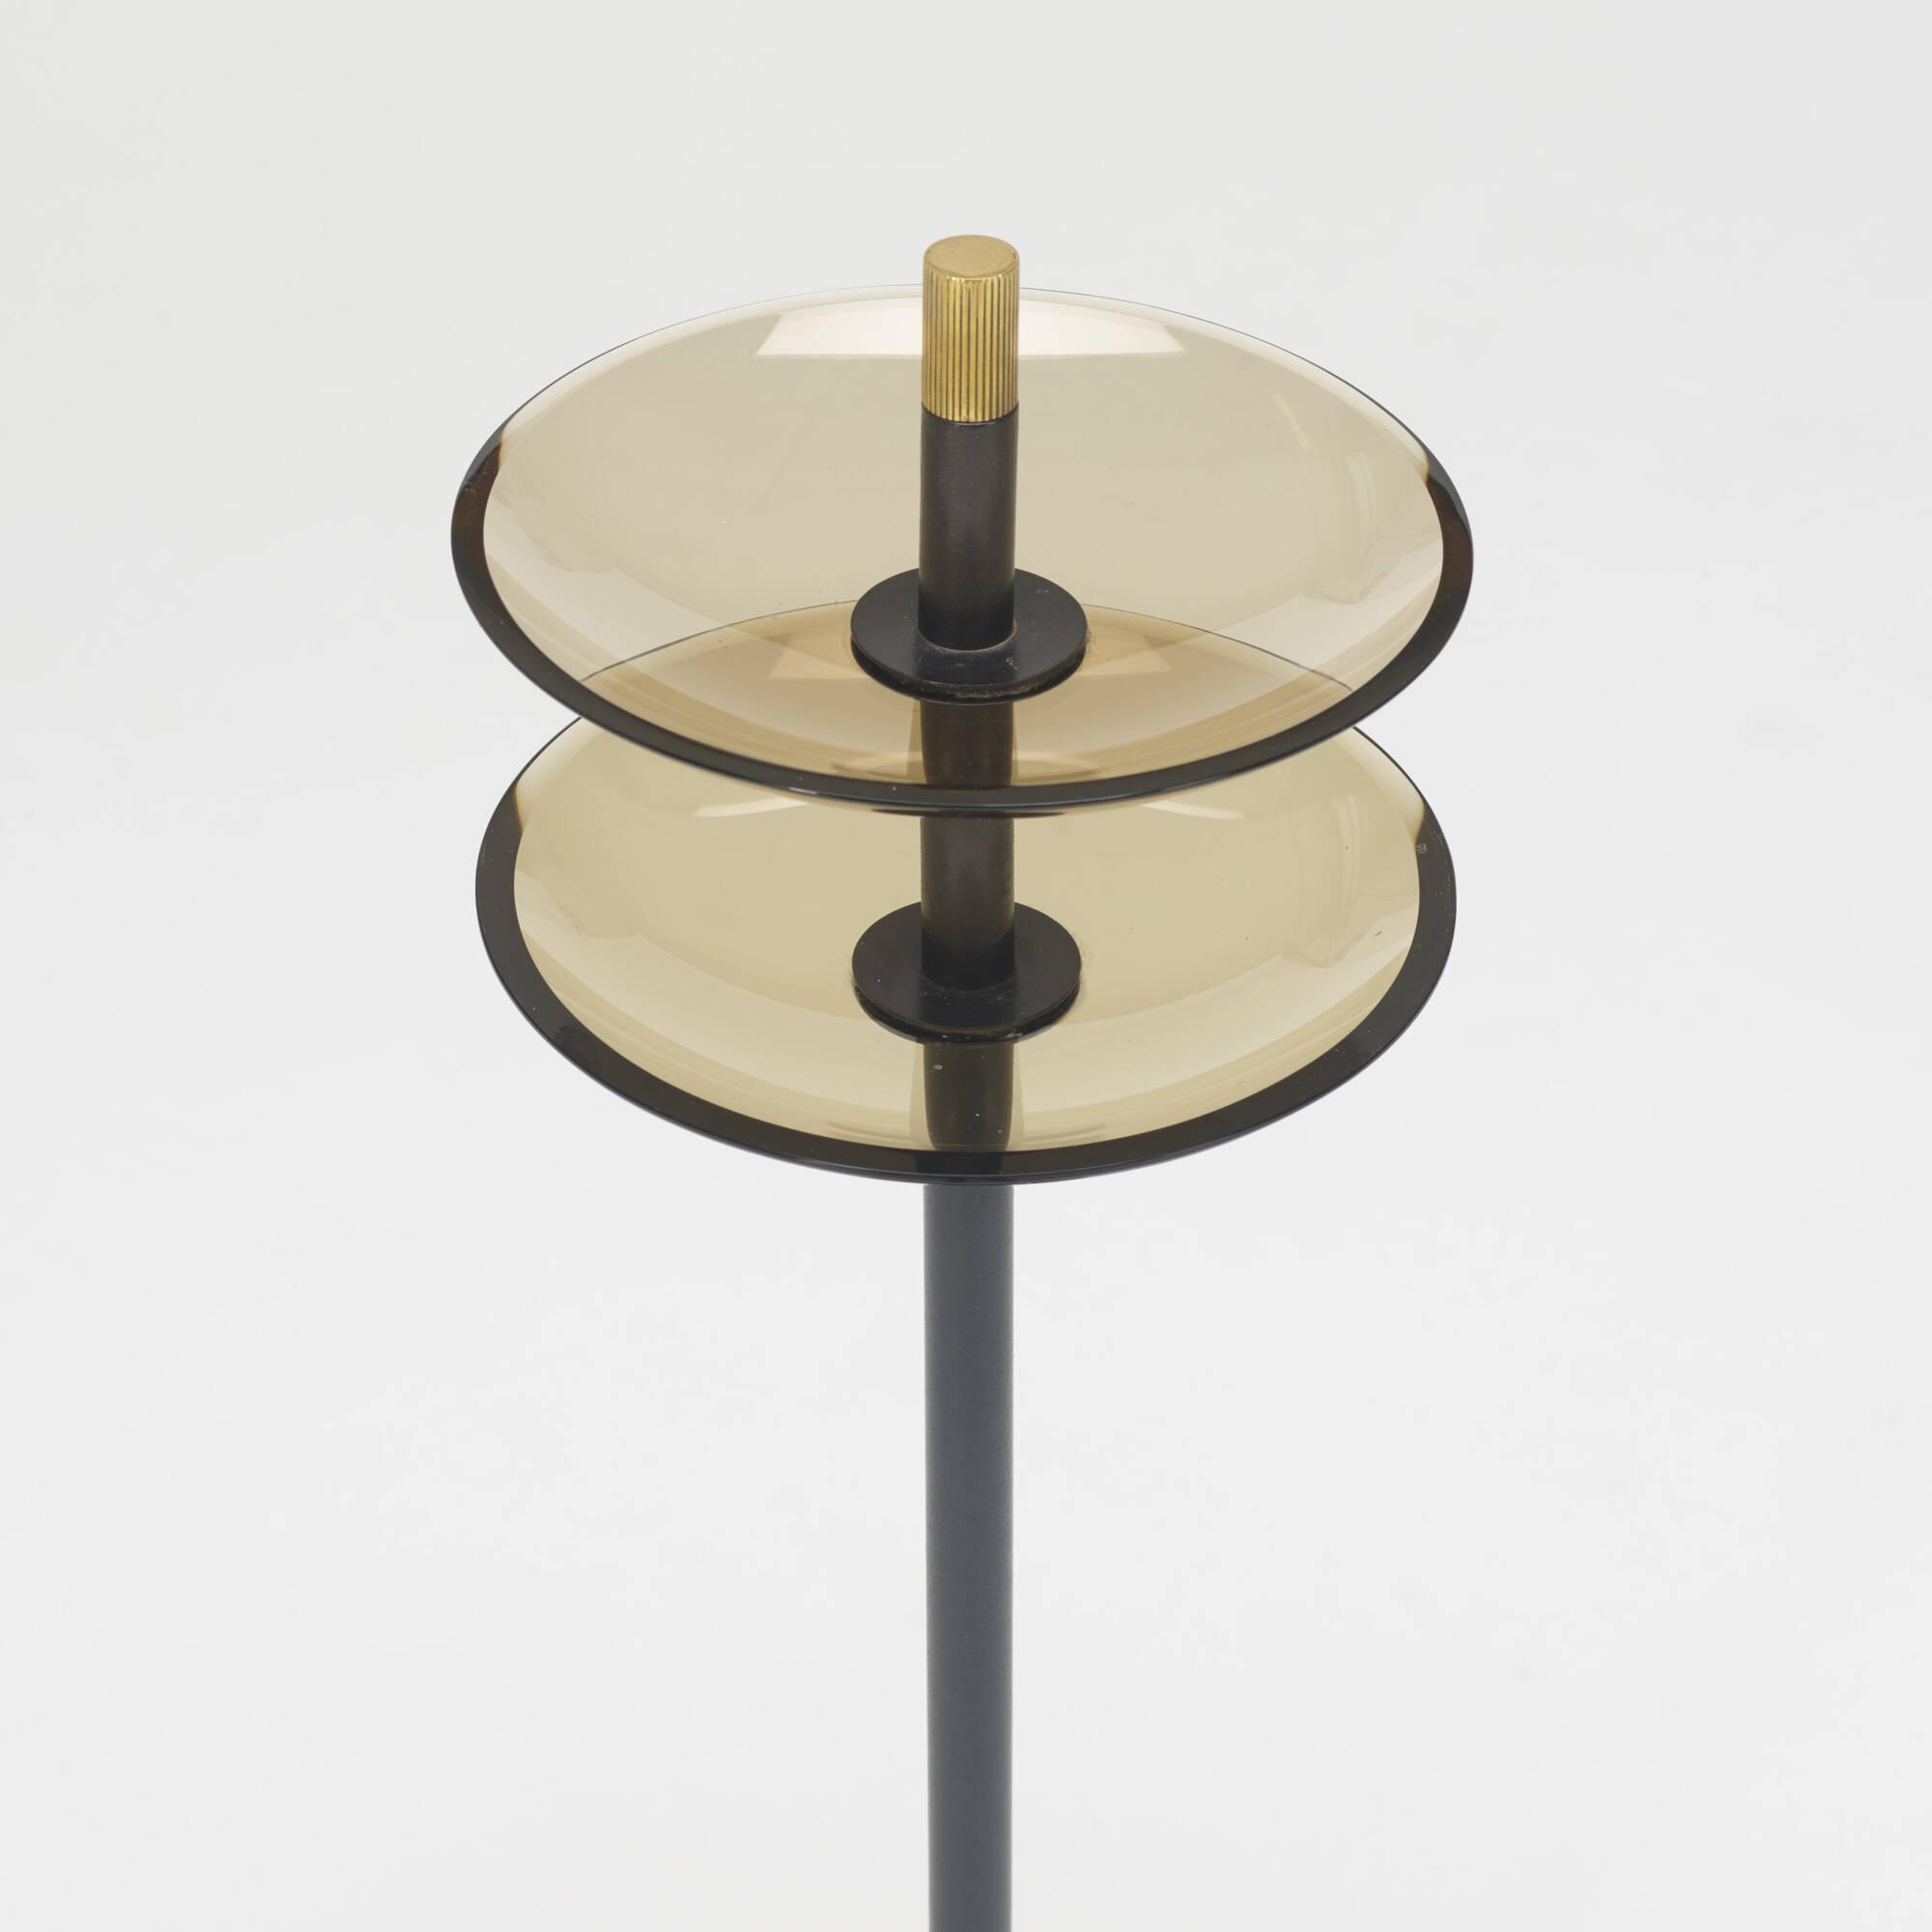 188: Fontana Arte / ash stand, model 2087 (2 of 2)